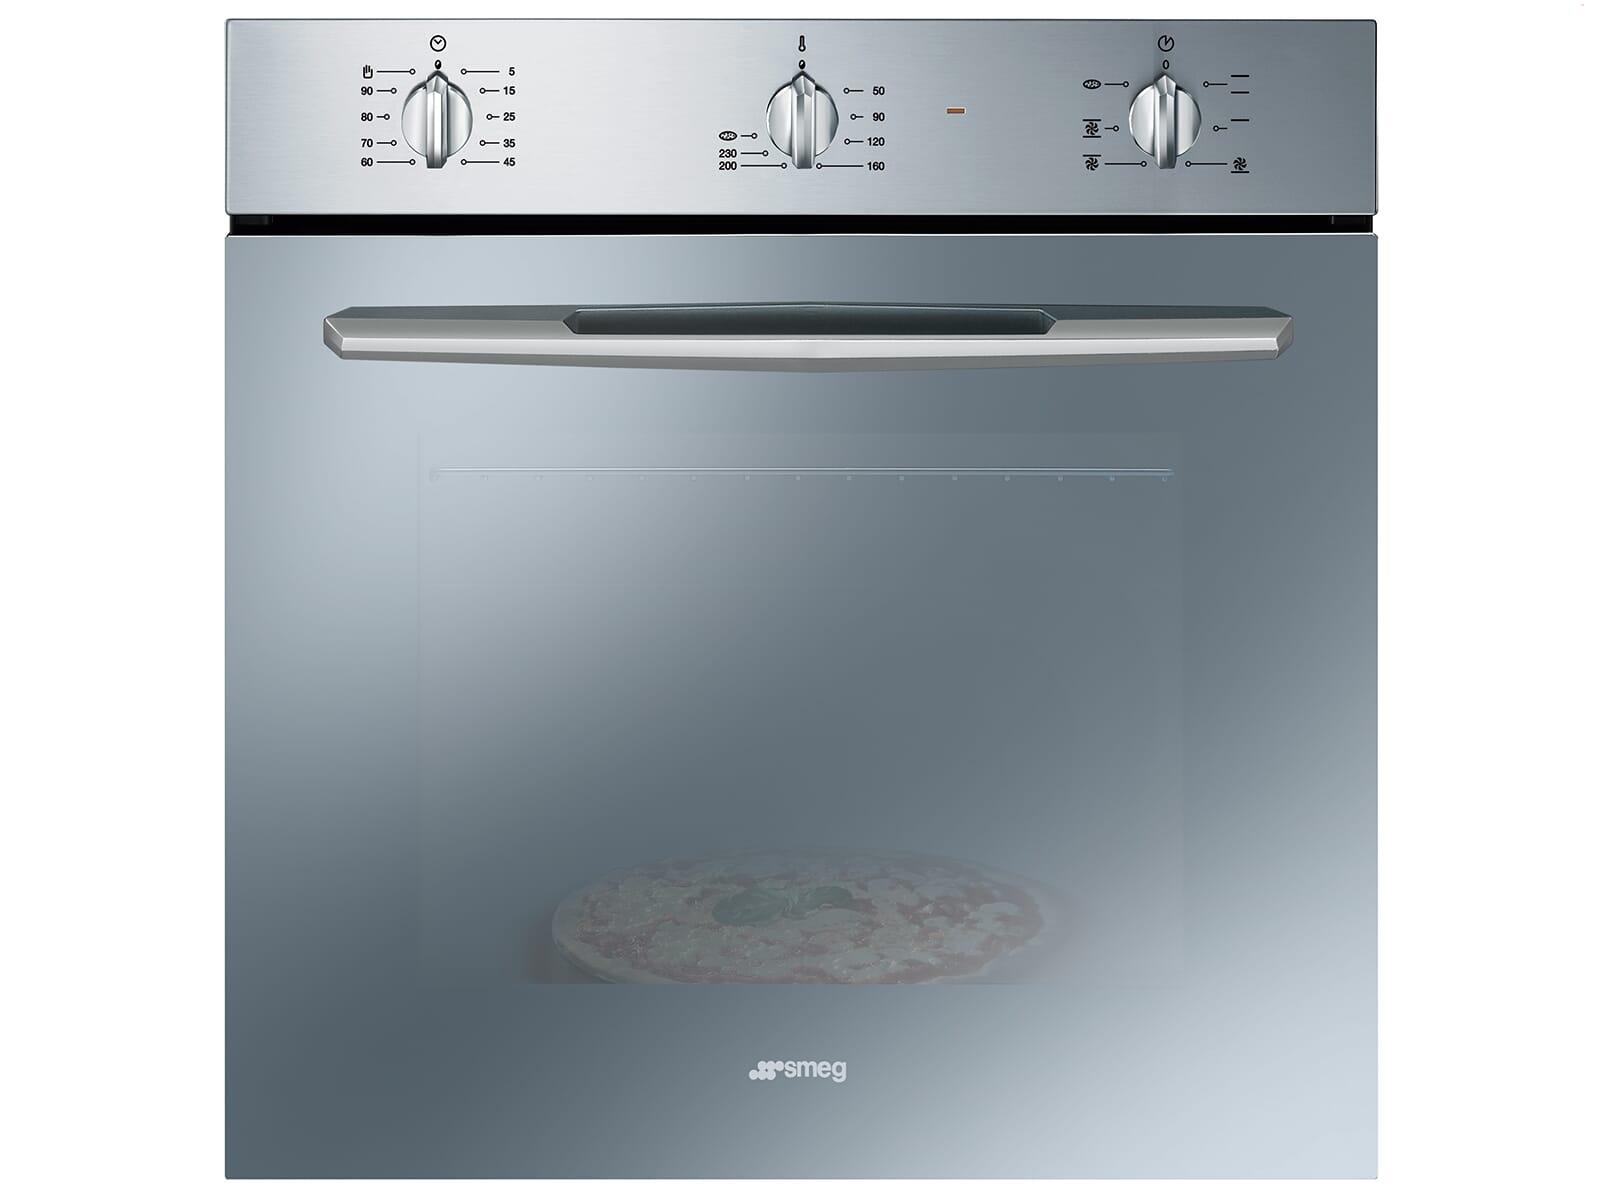 Smeg Kühlschrank 140 Cm : Smeg kühlschrank 140 cm: smeg s lfld p einbau kühlschrank kühlgerät